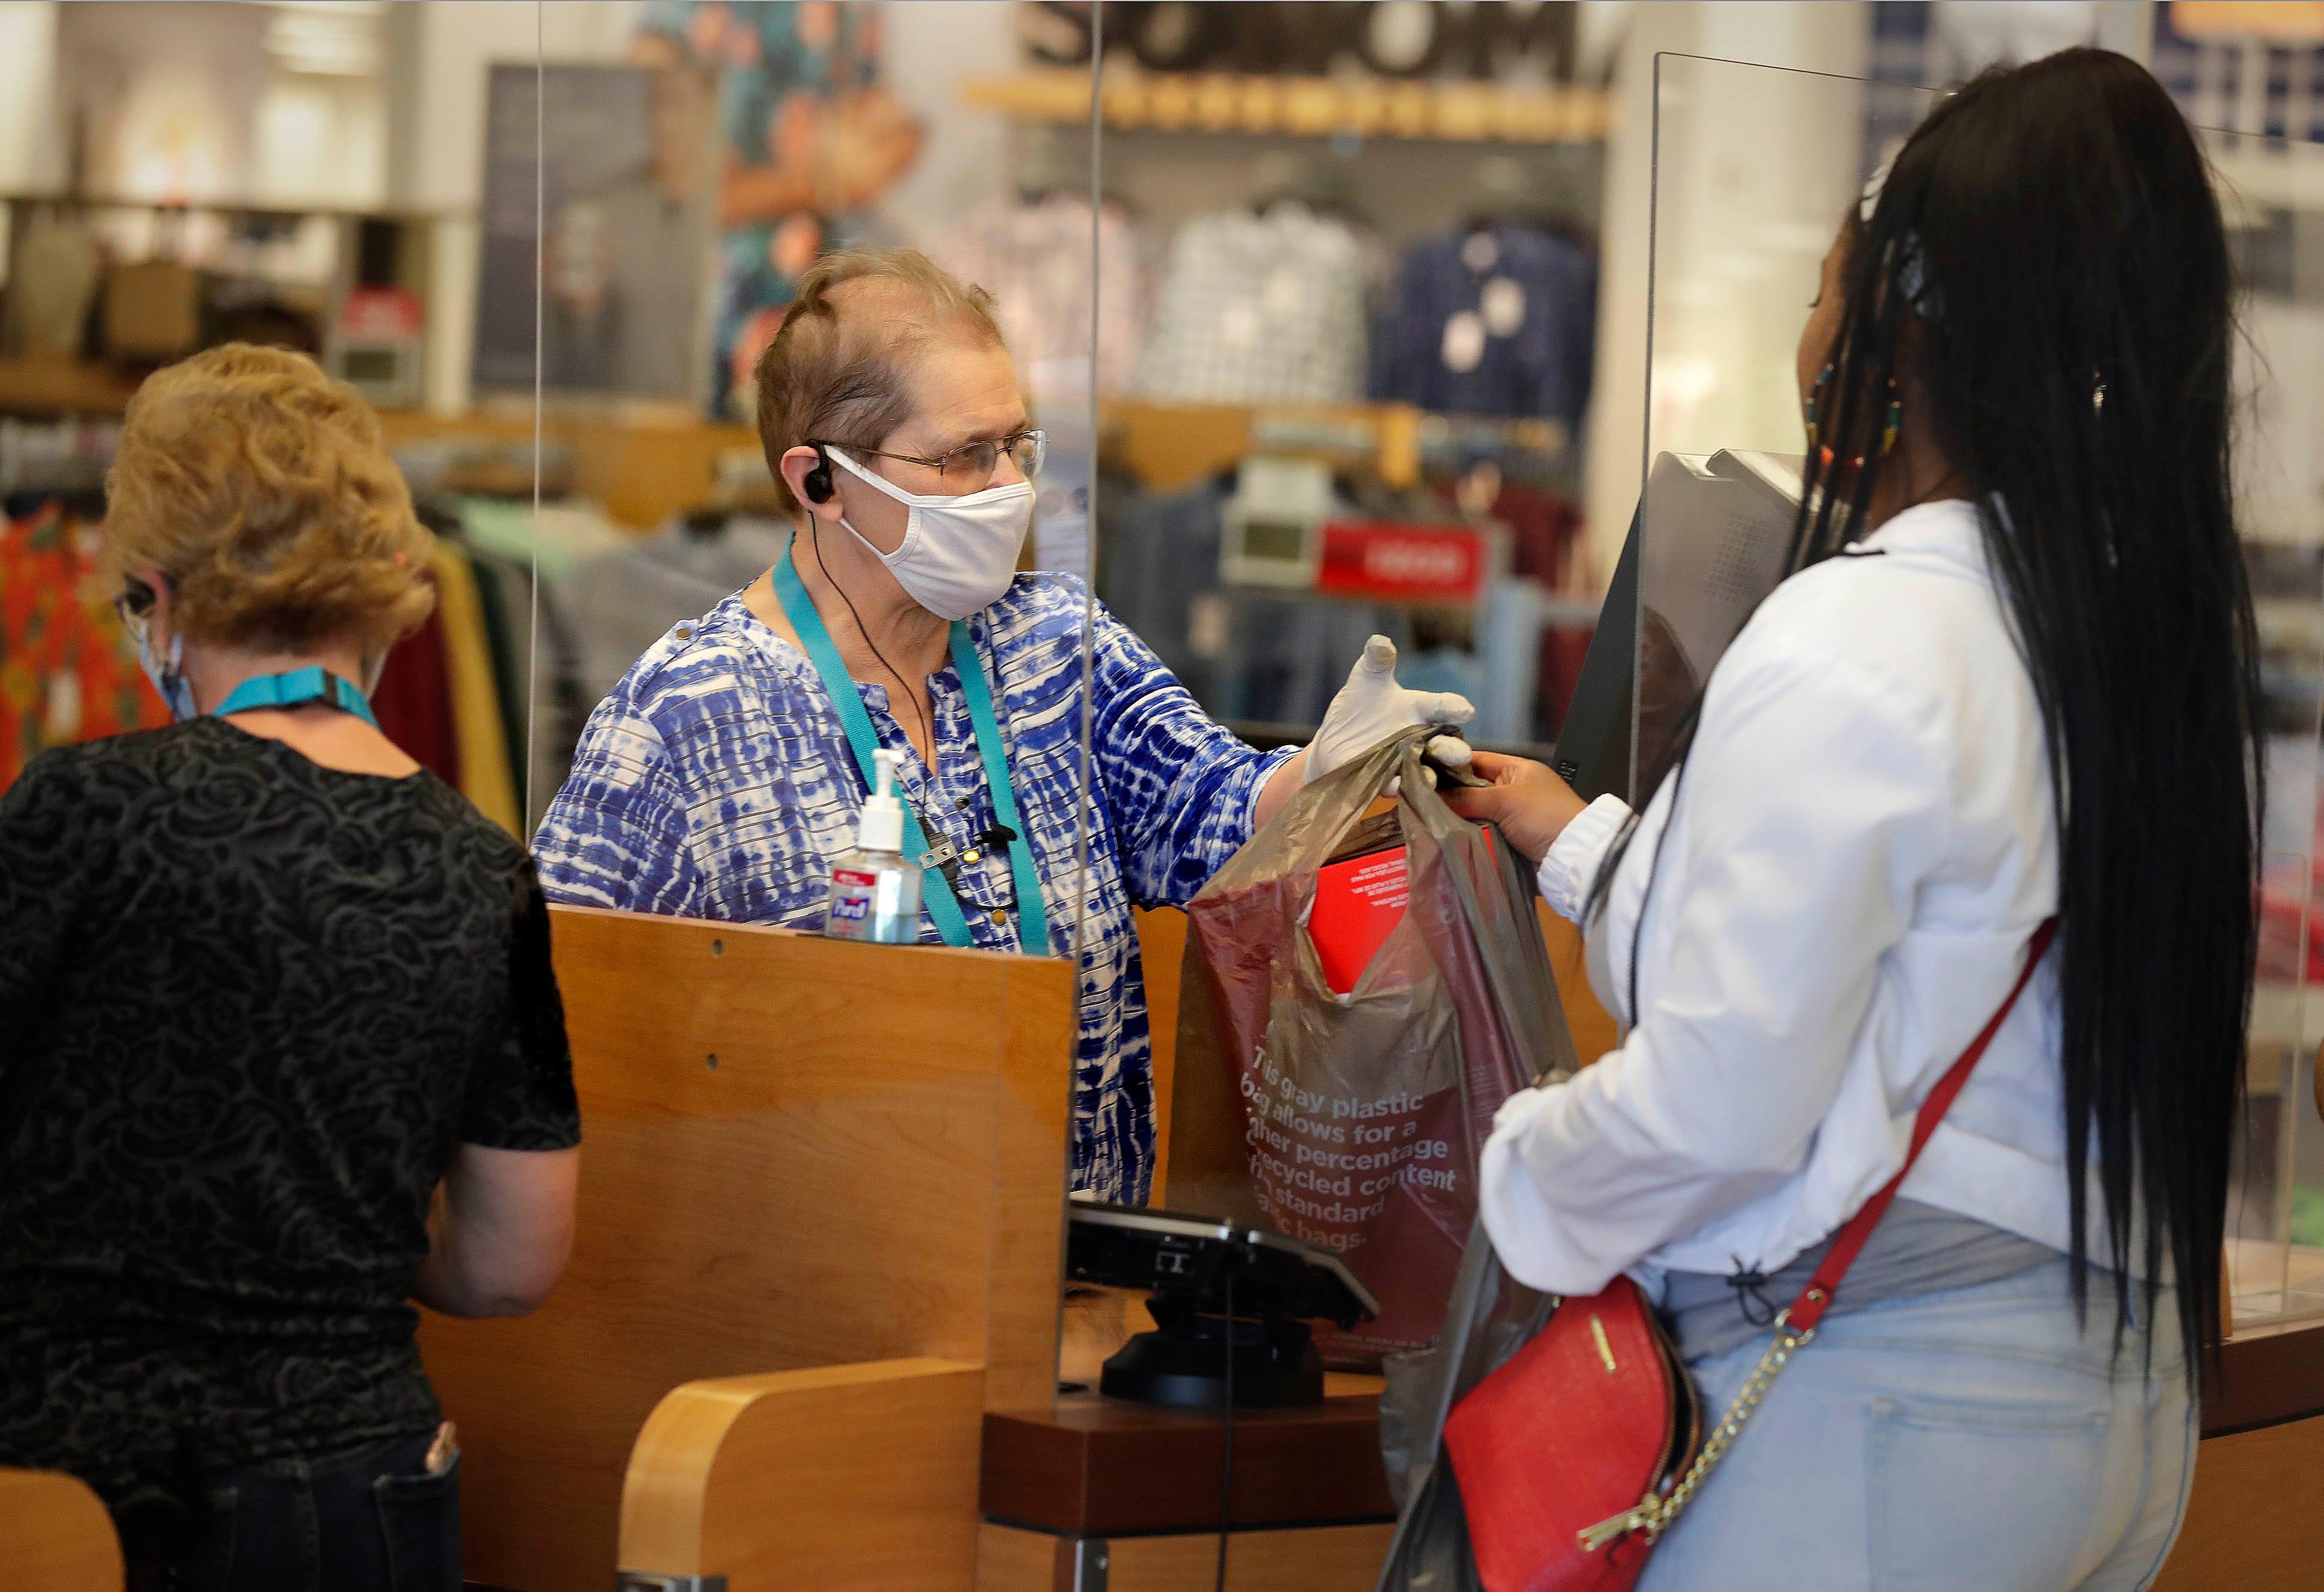 Kohl's had its best quarter since the coronavirus pandemic began